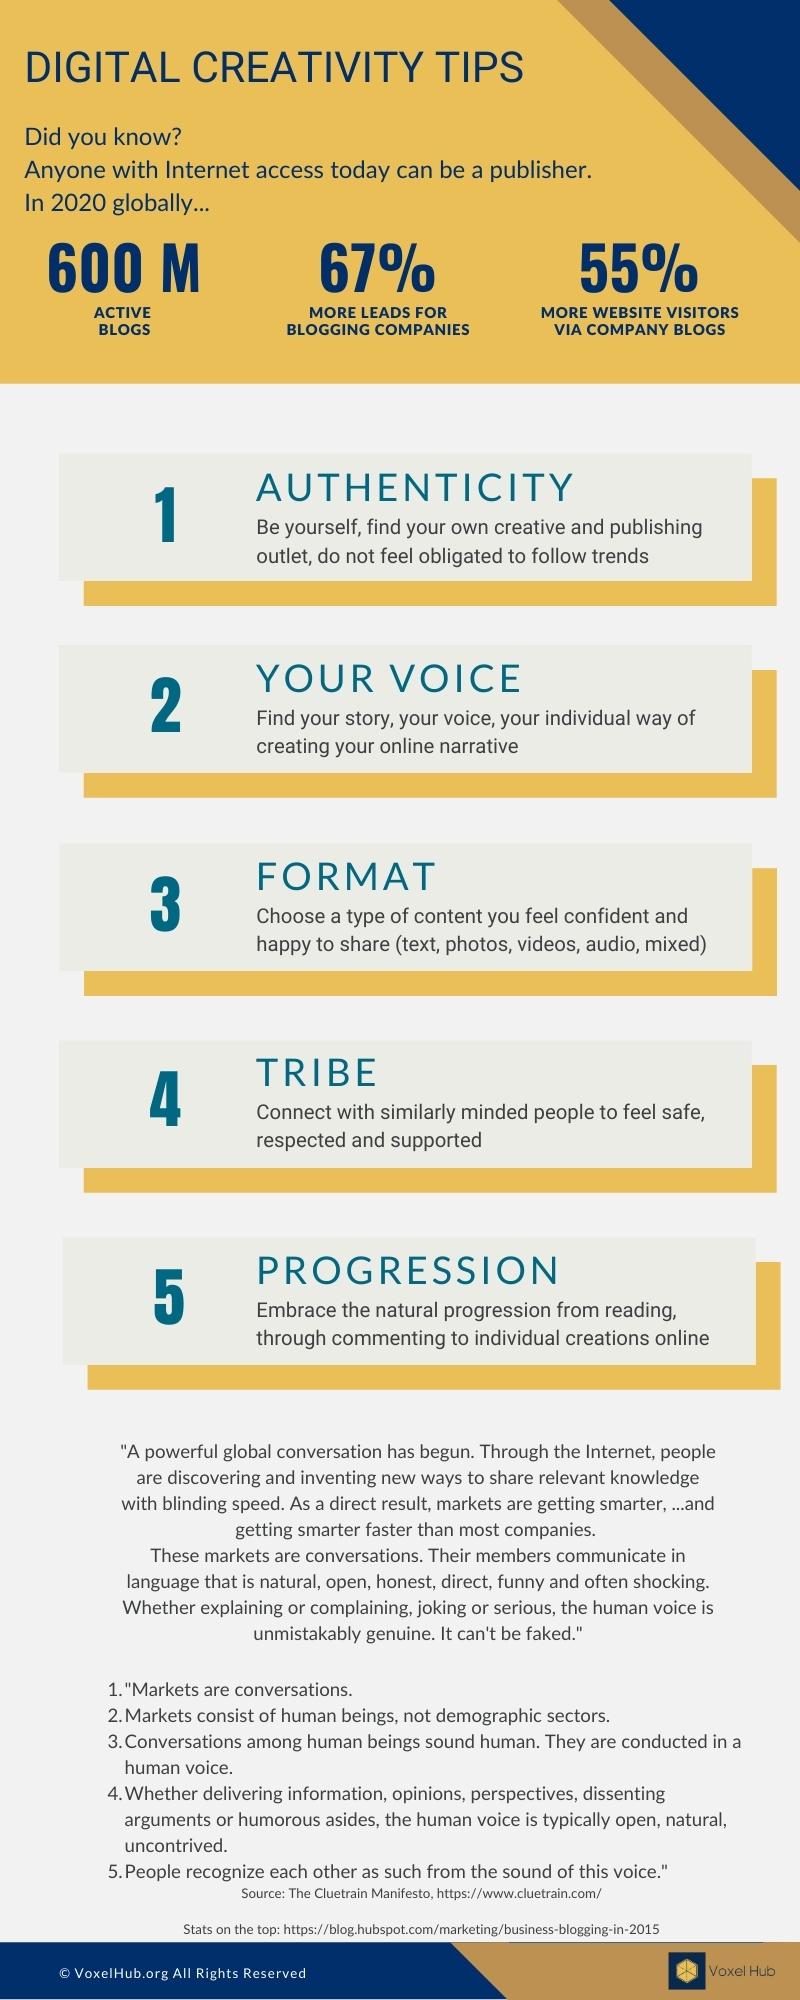 Digital Creativity Tips